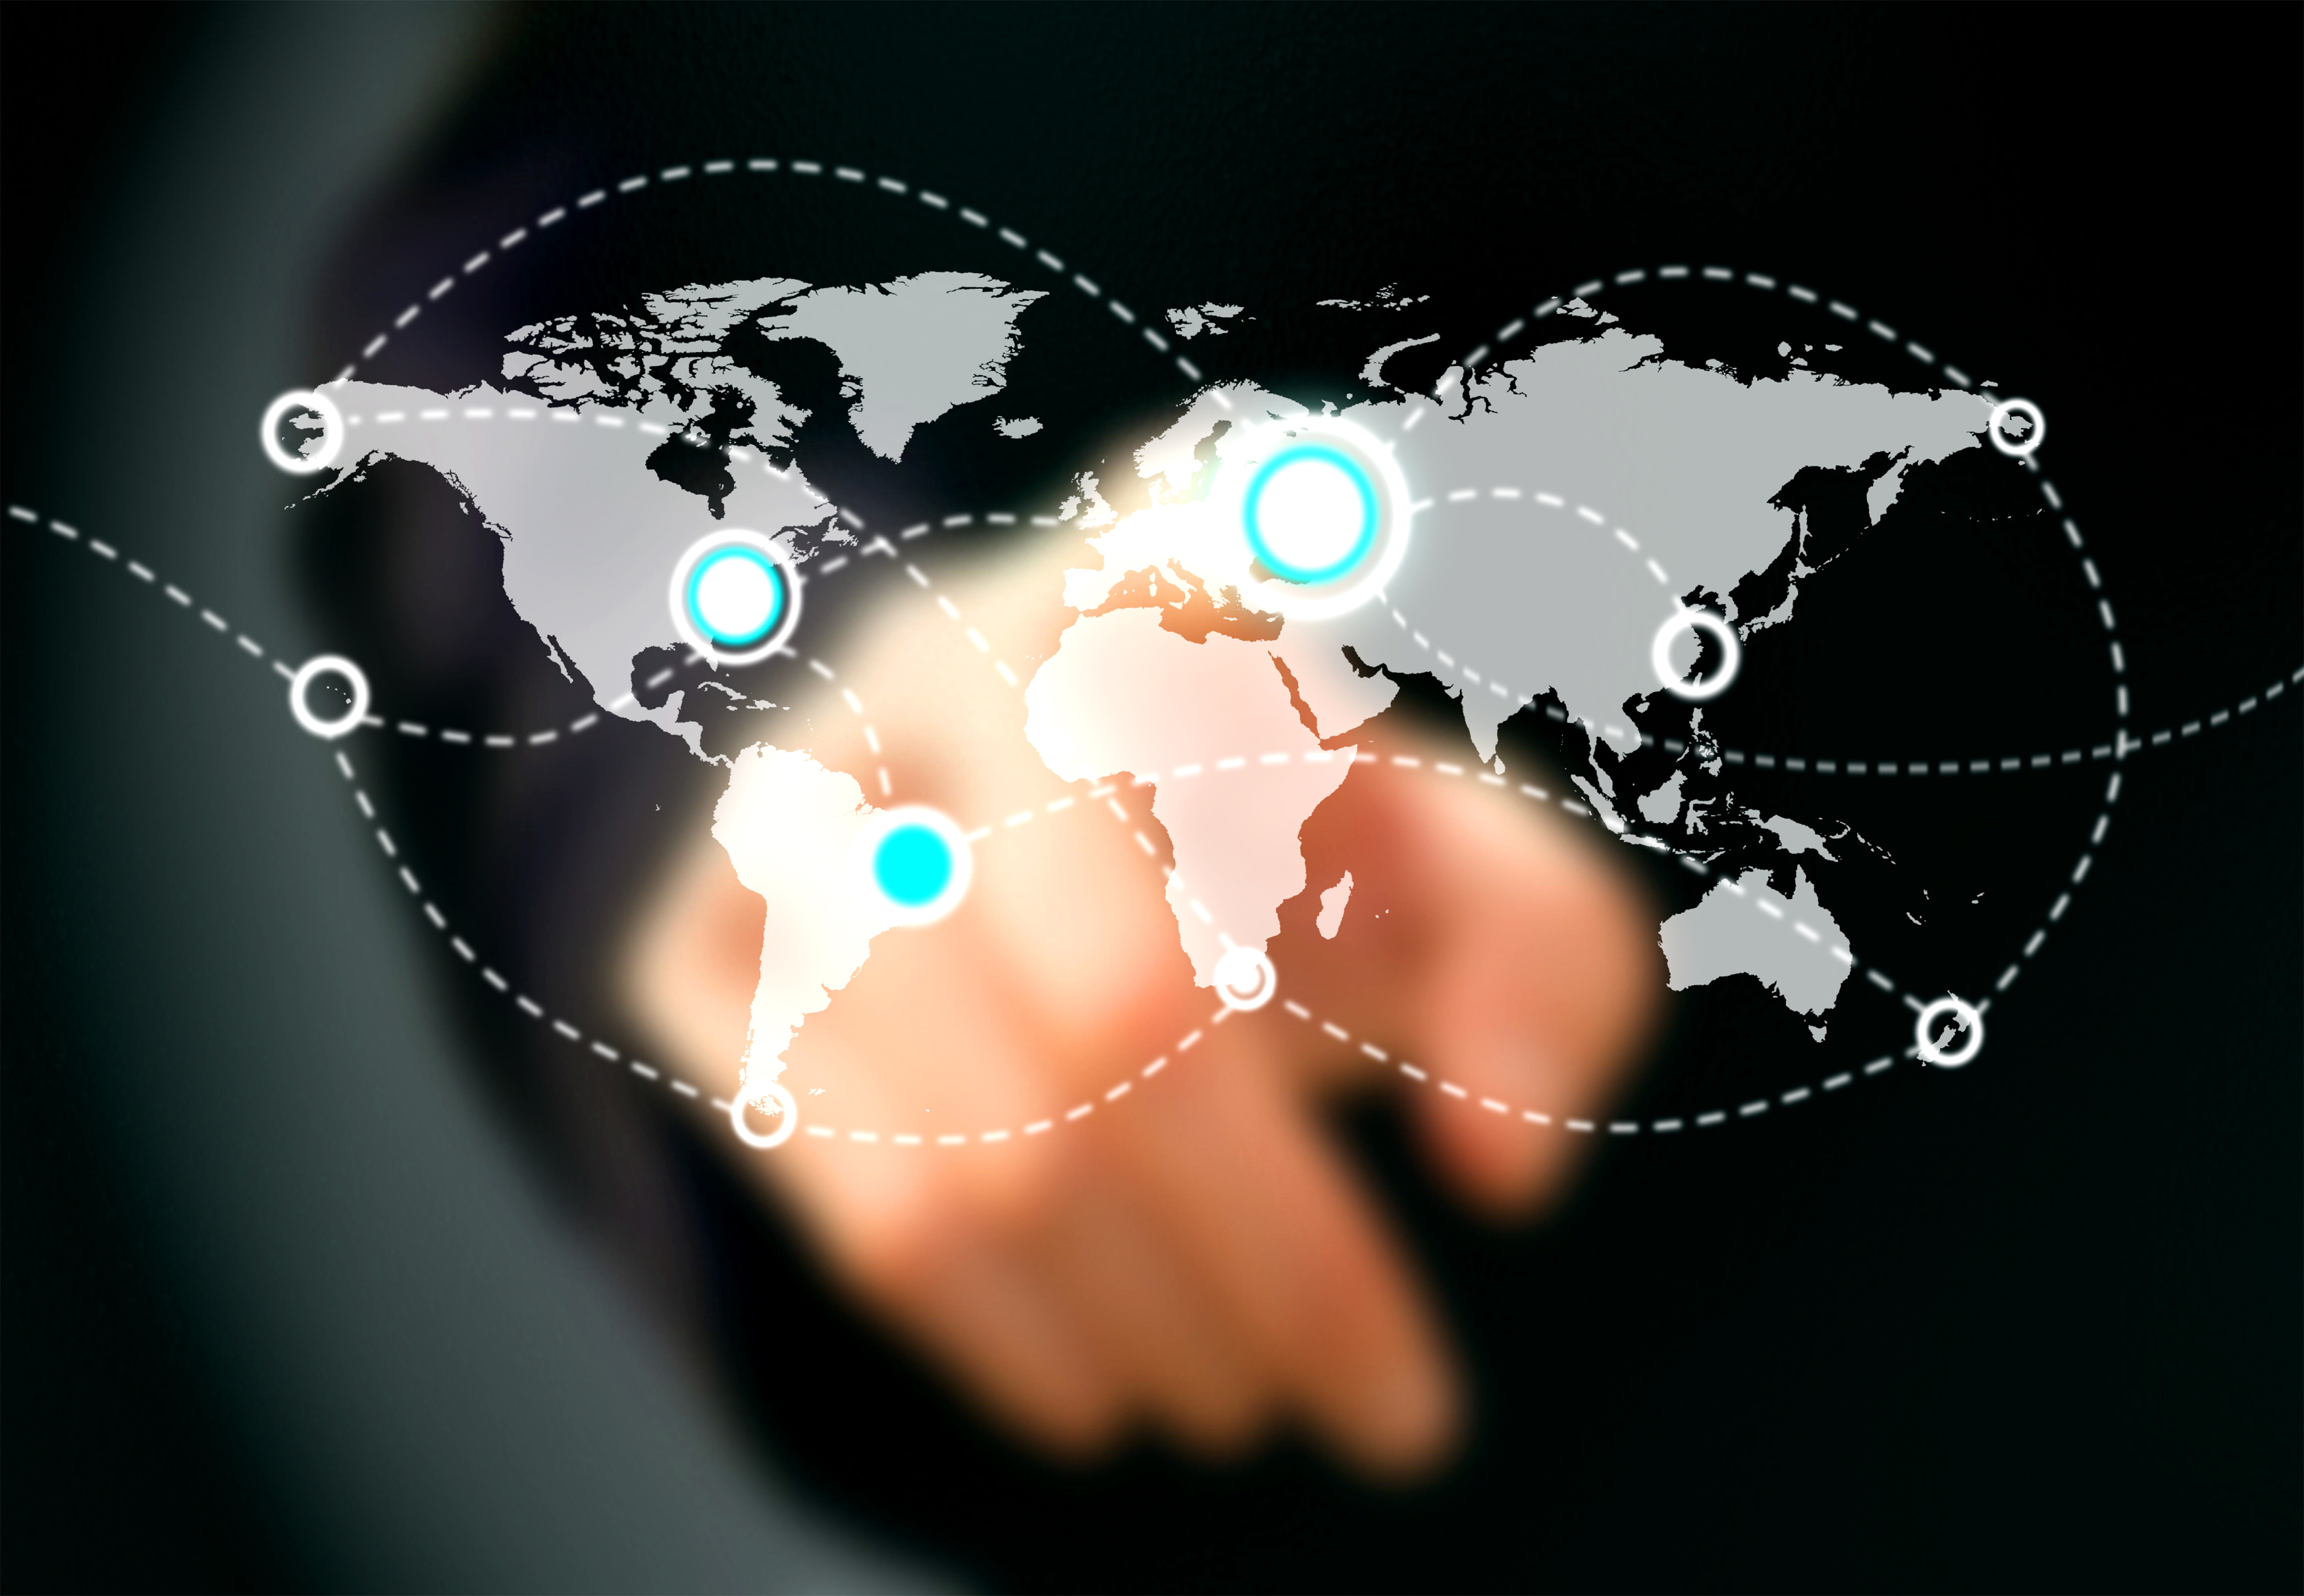 stockvault-businessman-touching-virtual-